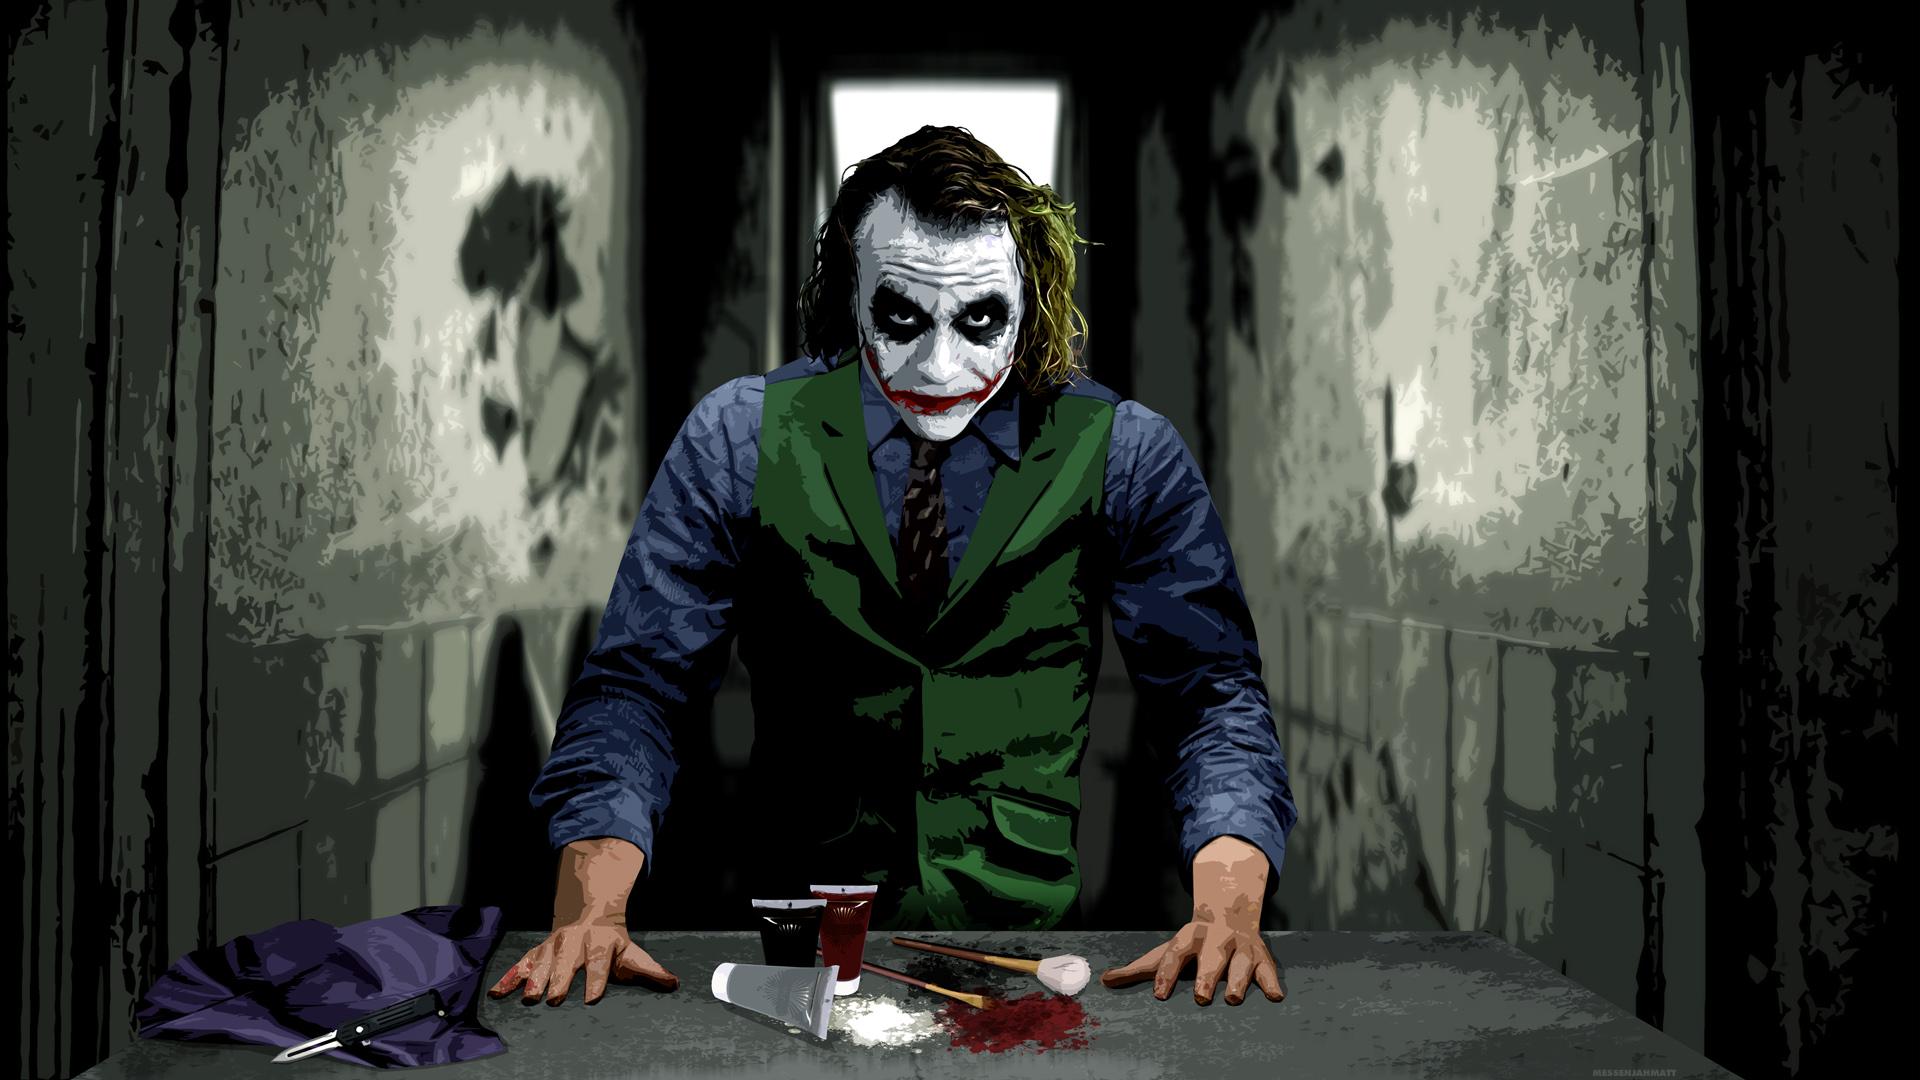 the joker wallpapers pictures